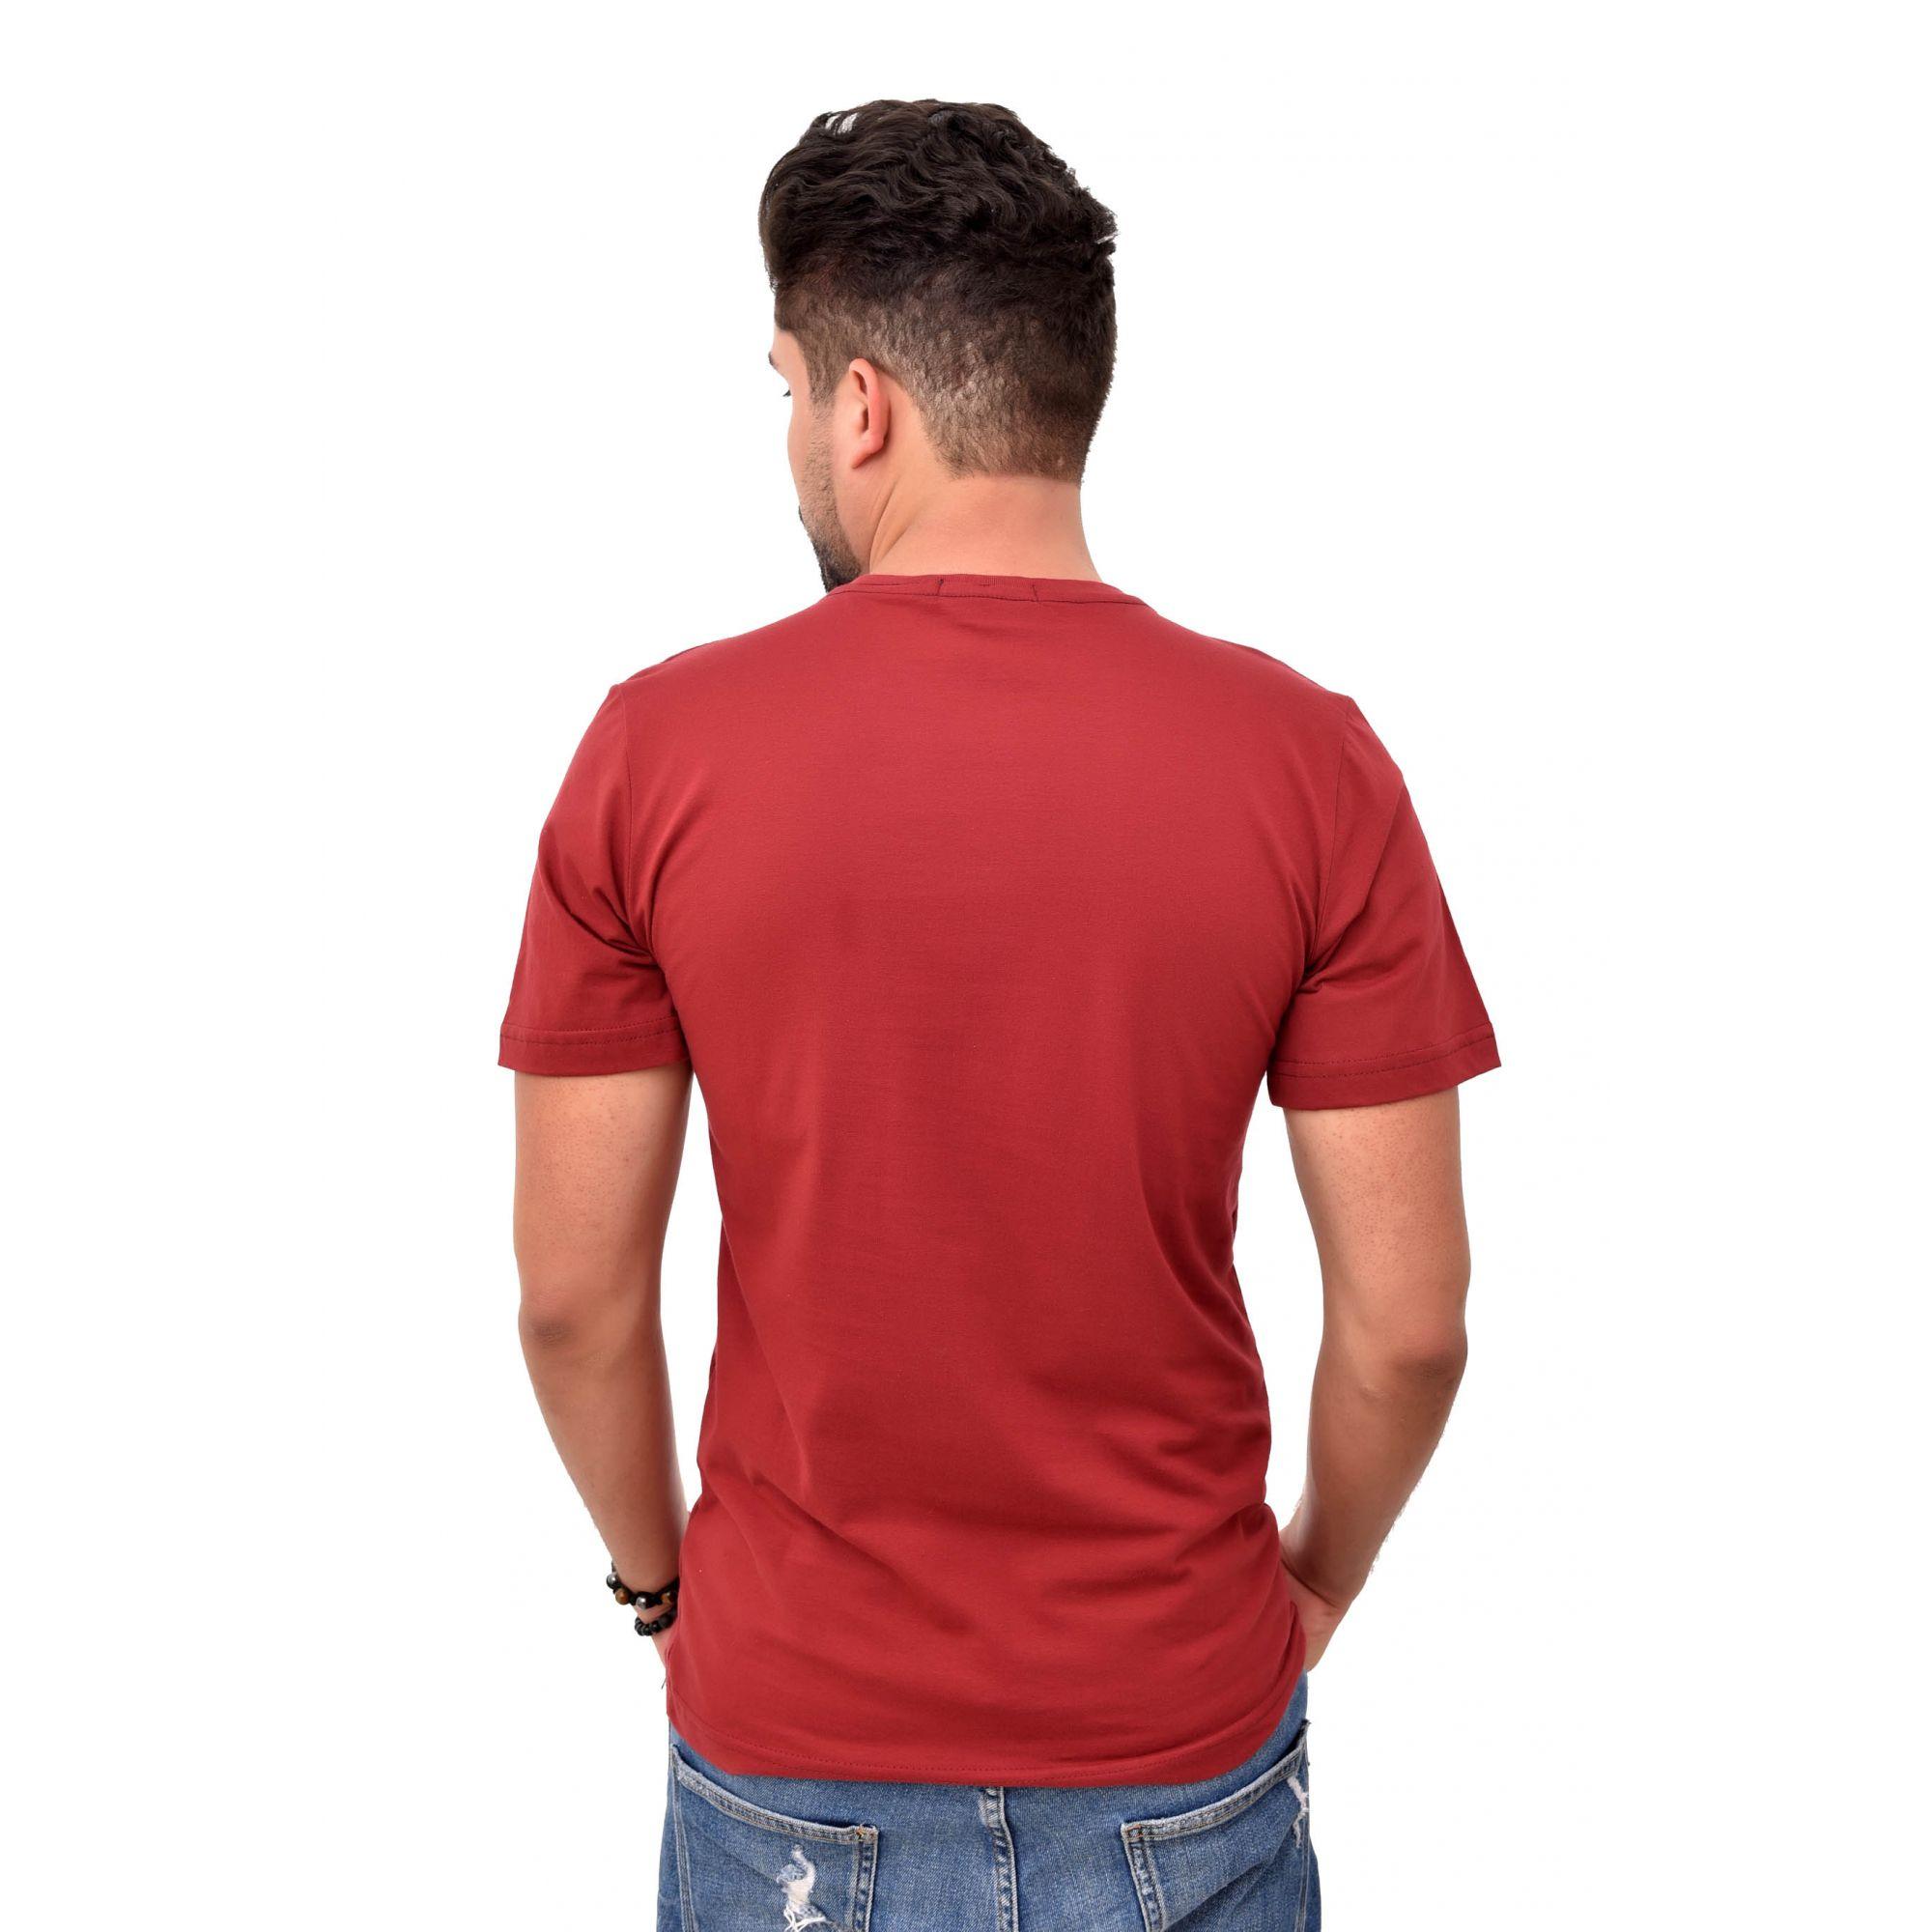 Camiseta Basic RL Vinho Colored  - Ca Brasileira